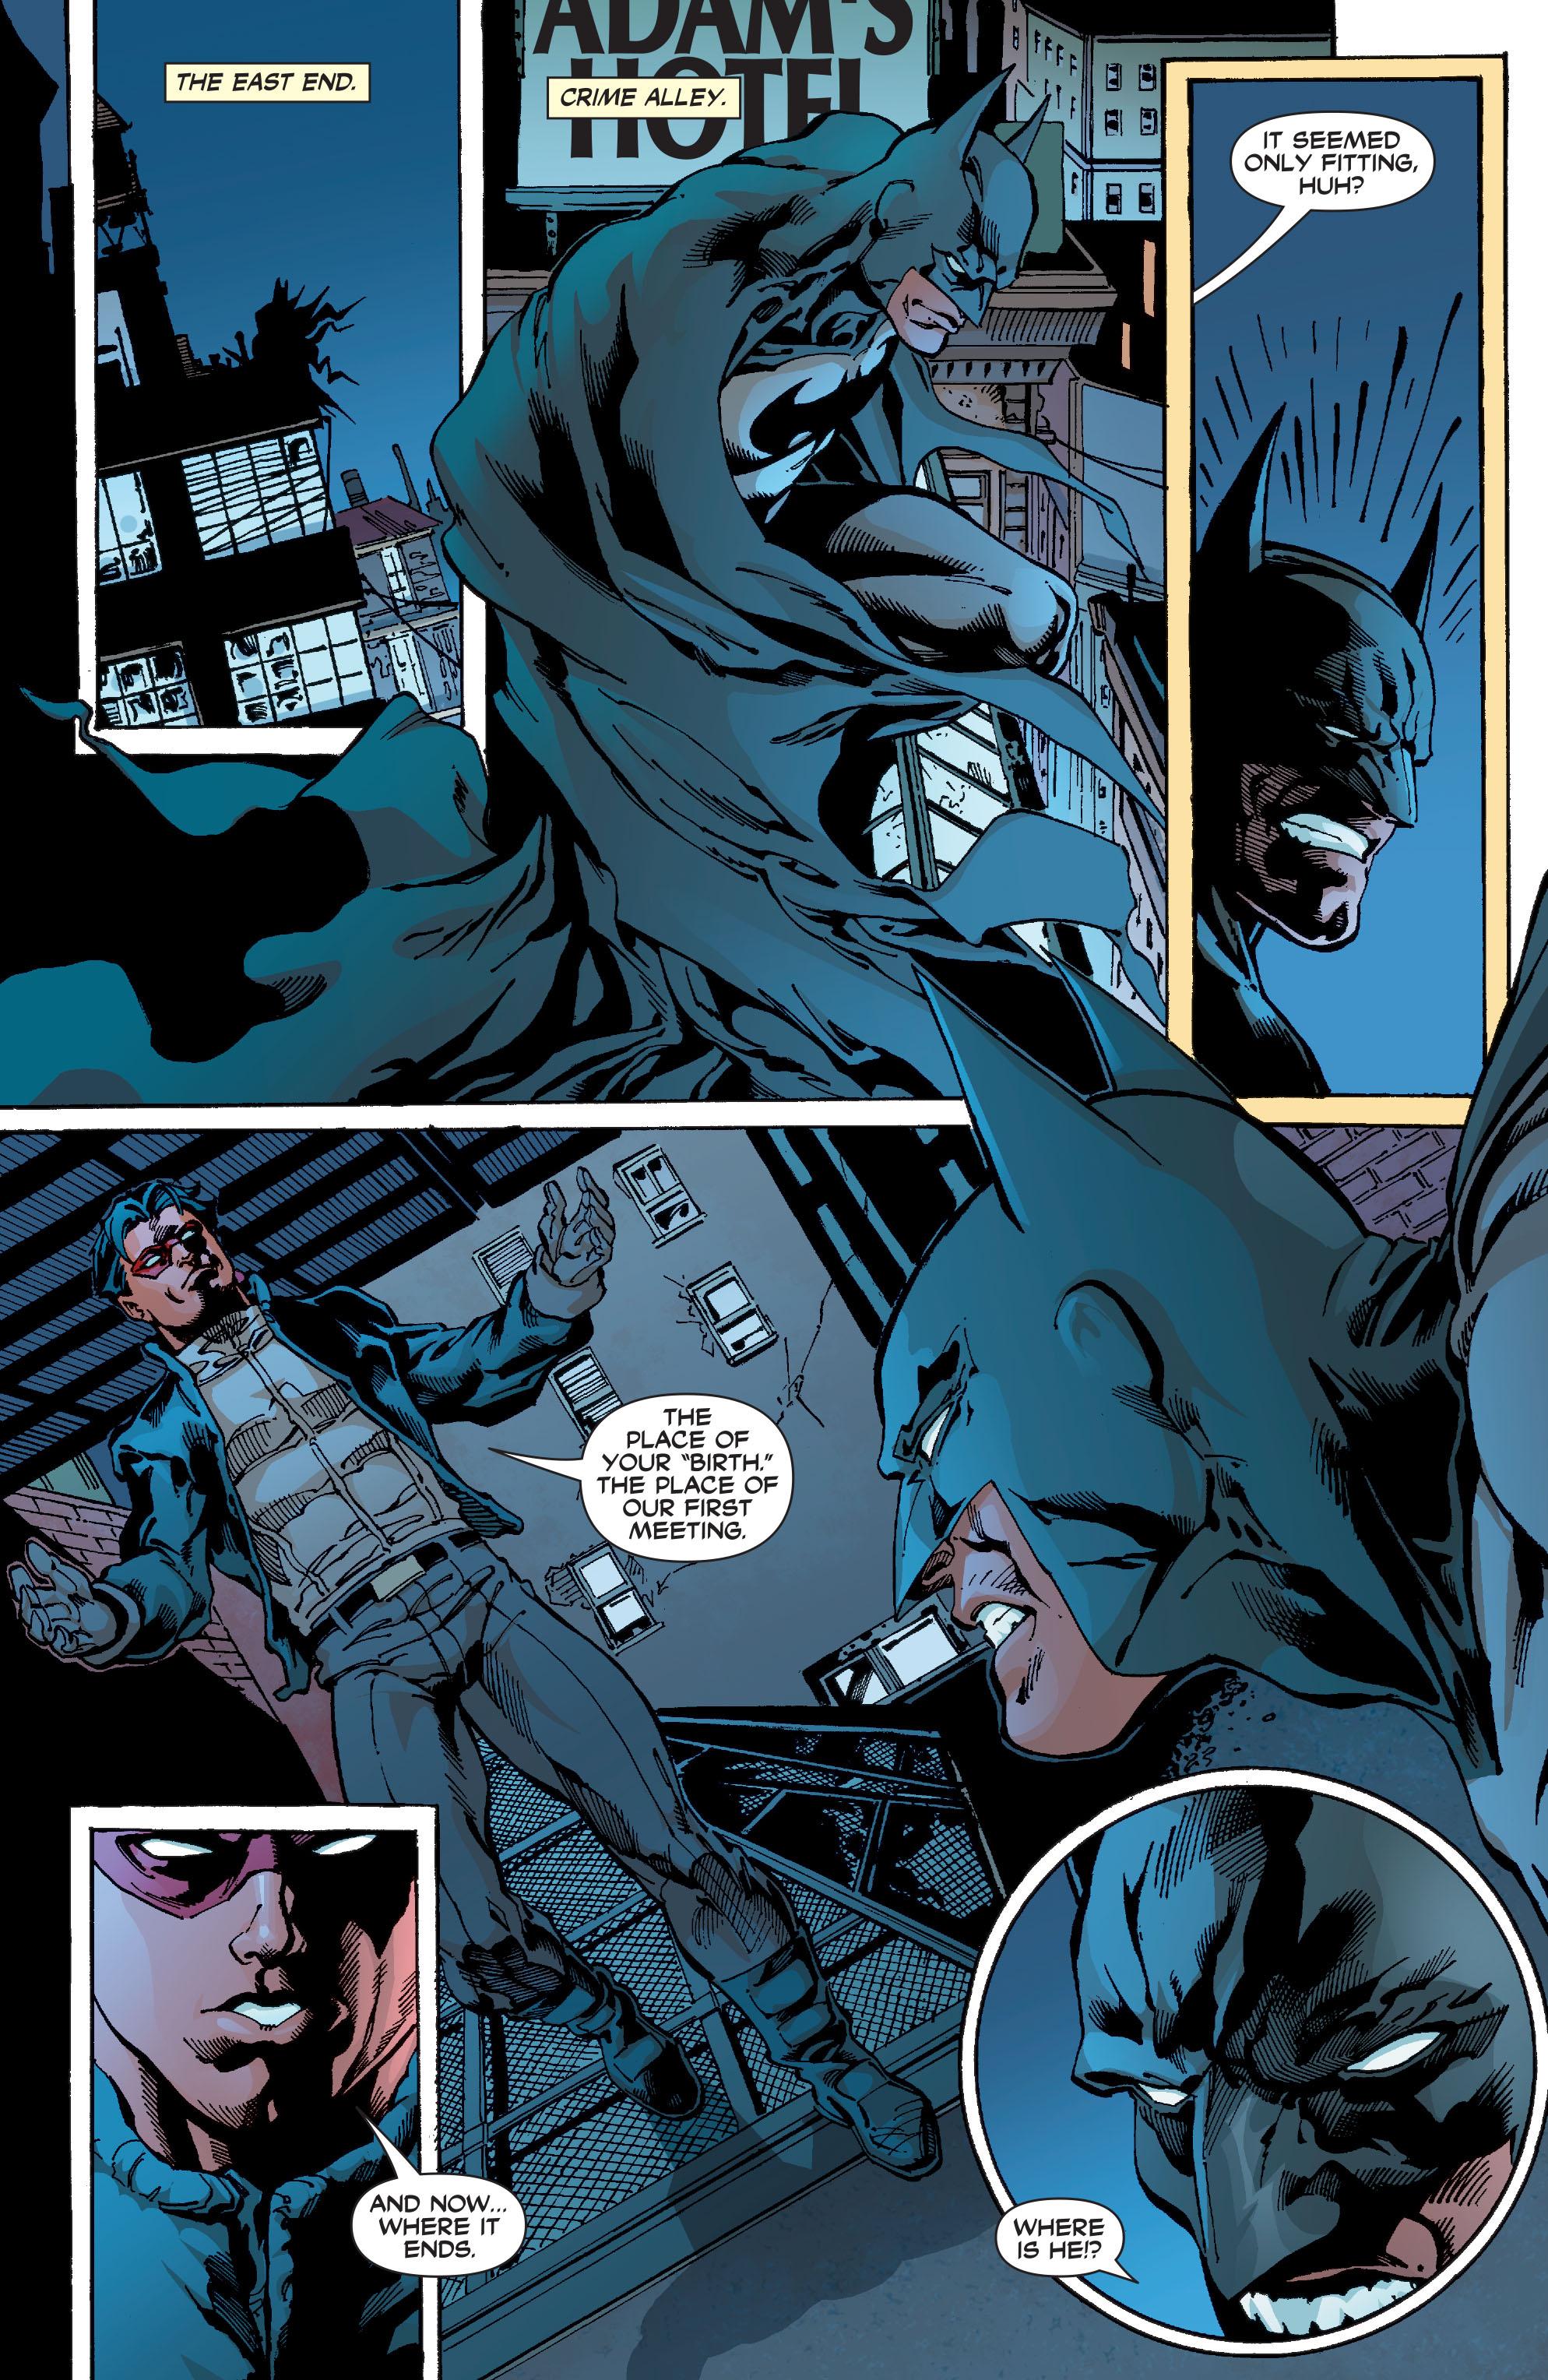 Psychology of Bruce Wayne Df7ve7AiAyyPMoOYCyMmZzidDDwIa1mhL74EWMttGv_d18y9bwfRJiRkZYoxPppBAP4En_DQQ6dv=s0